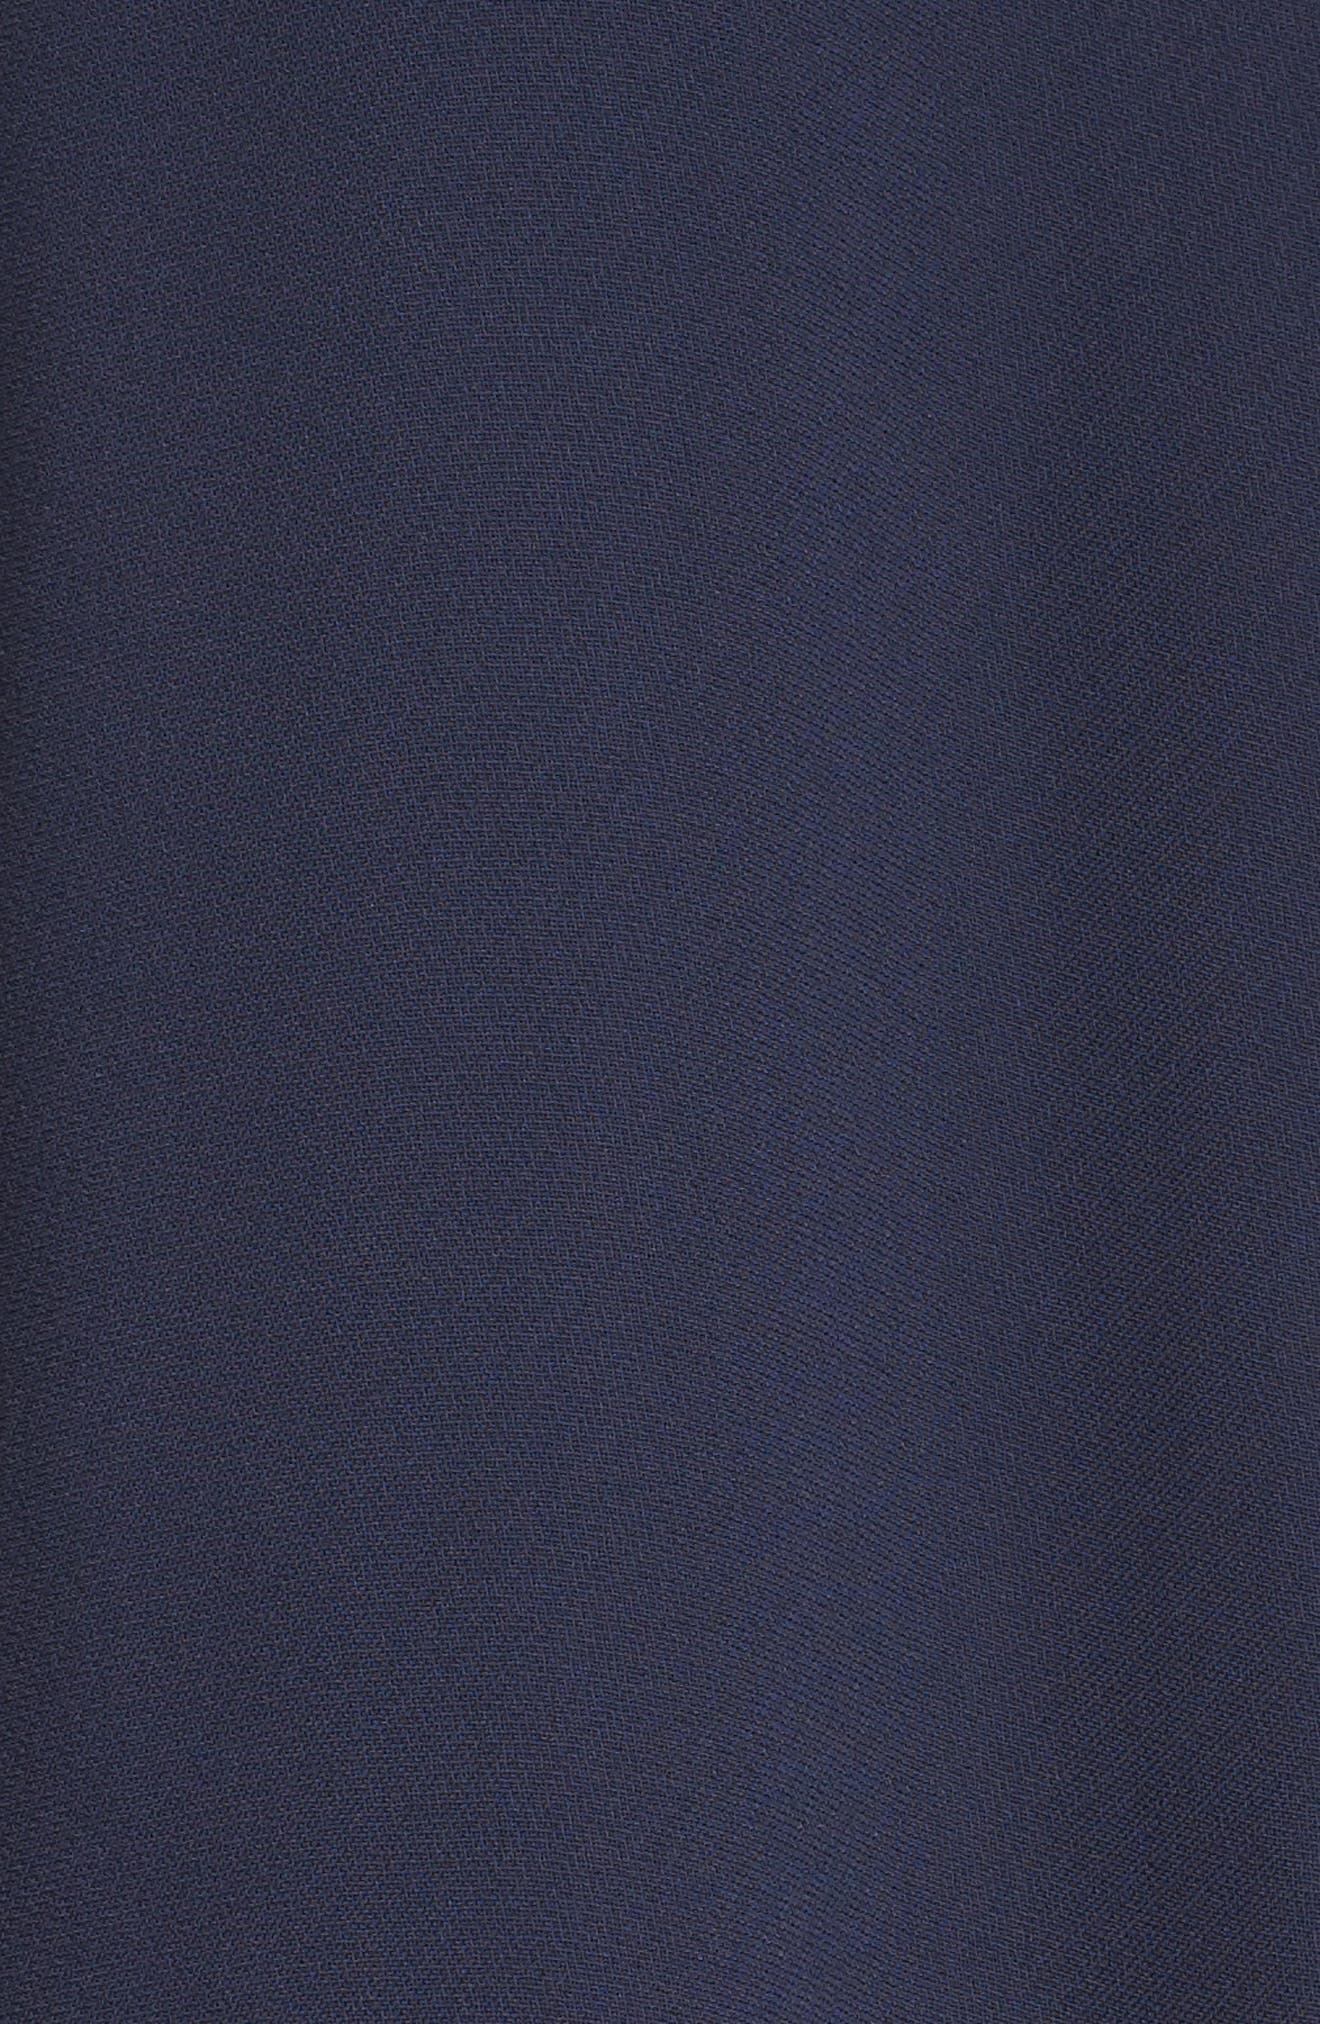 Evening Dew Sleeveless Romper,                             Alternate thumbnail 5, color,                             400